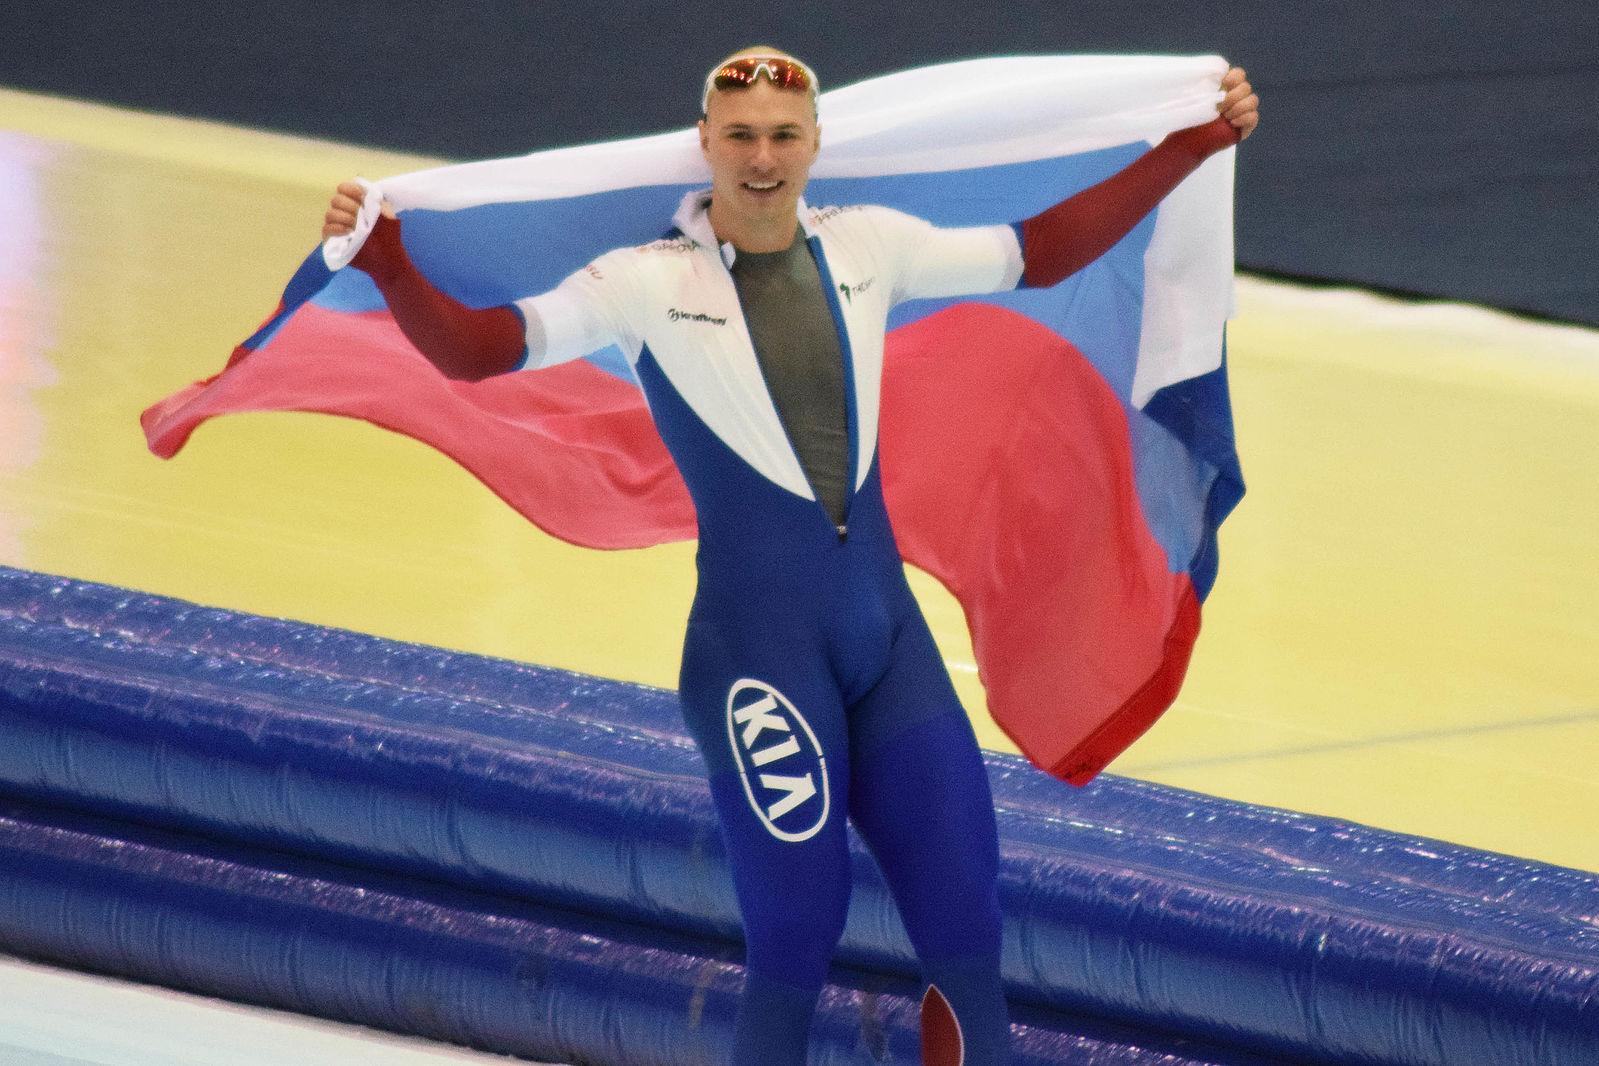 Speedskating World Champion Pavel Kulizhnikov of Russia is among those who have tested positive for meldonium. (Photo: Wikipedia Commons)